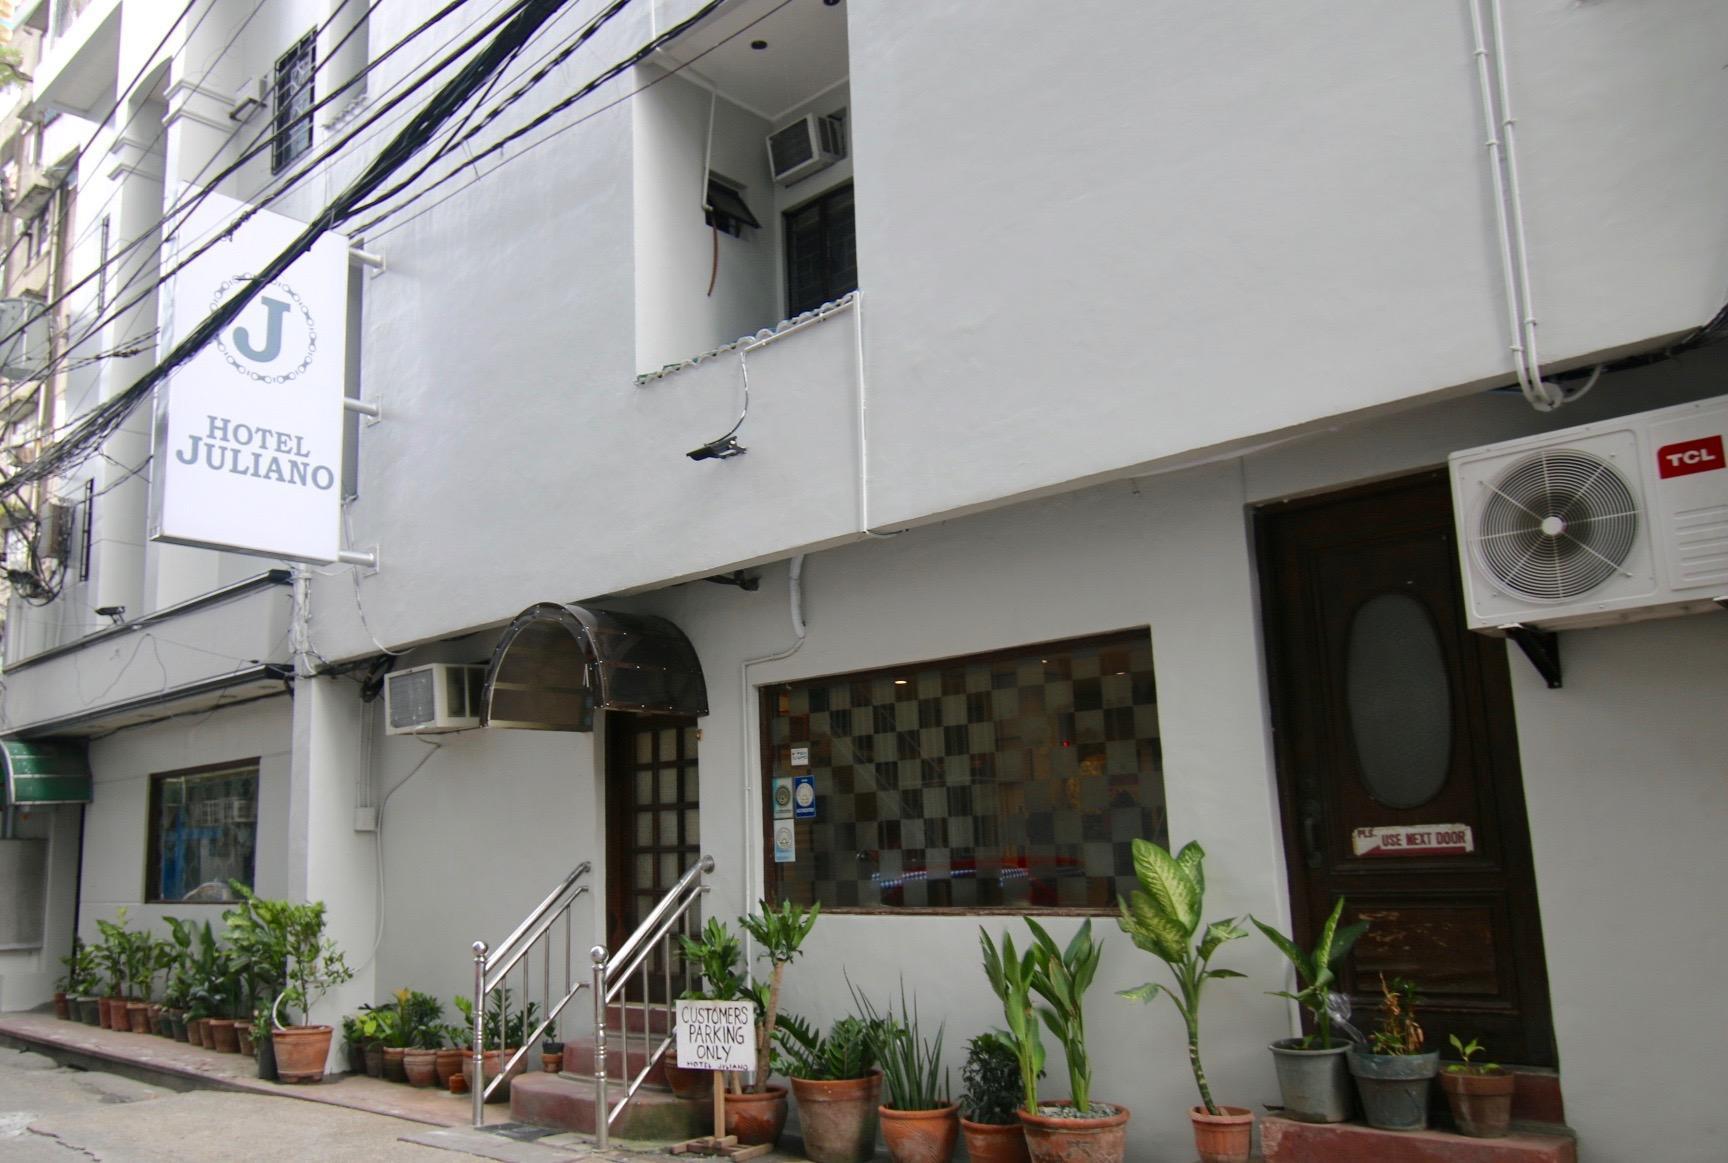 hotel juliano in manila